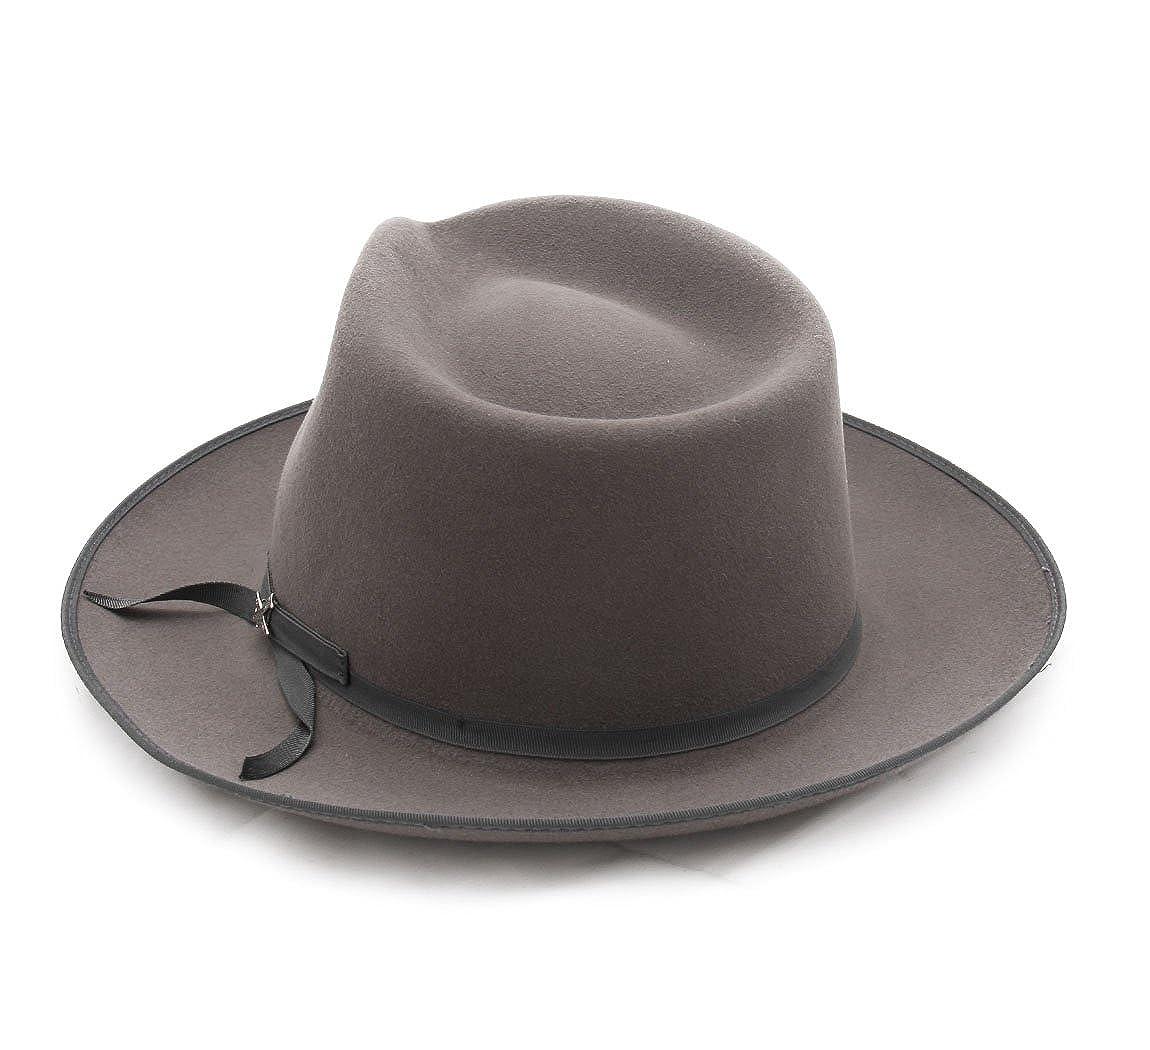 823bd4f0fedd52 Stetson - Fedora Hat wool felt men Stratoliner Fur Felt - Size L: Amazon.co. uk: Clothing